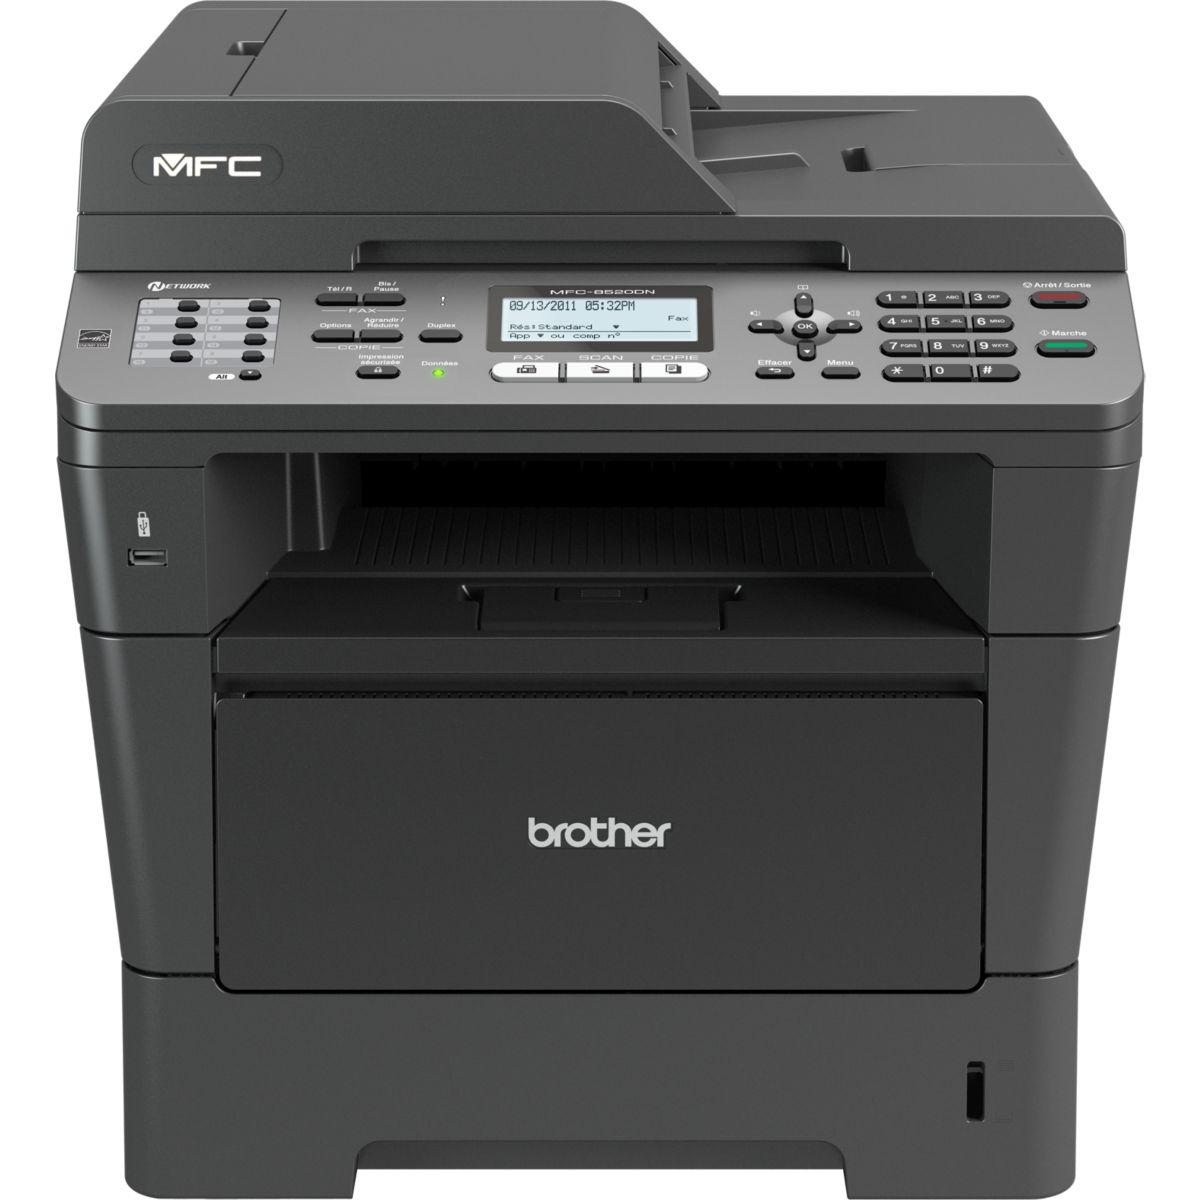 Imprimante multifonction laser monochrome BROTHER MFC-8520DN (photo)